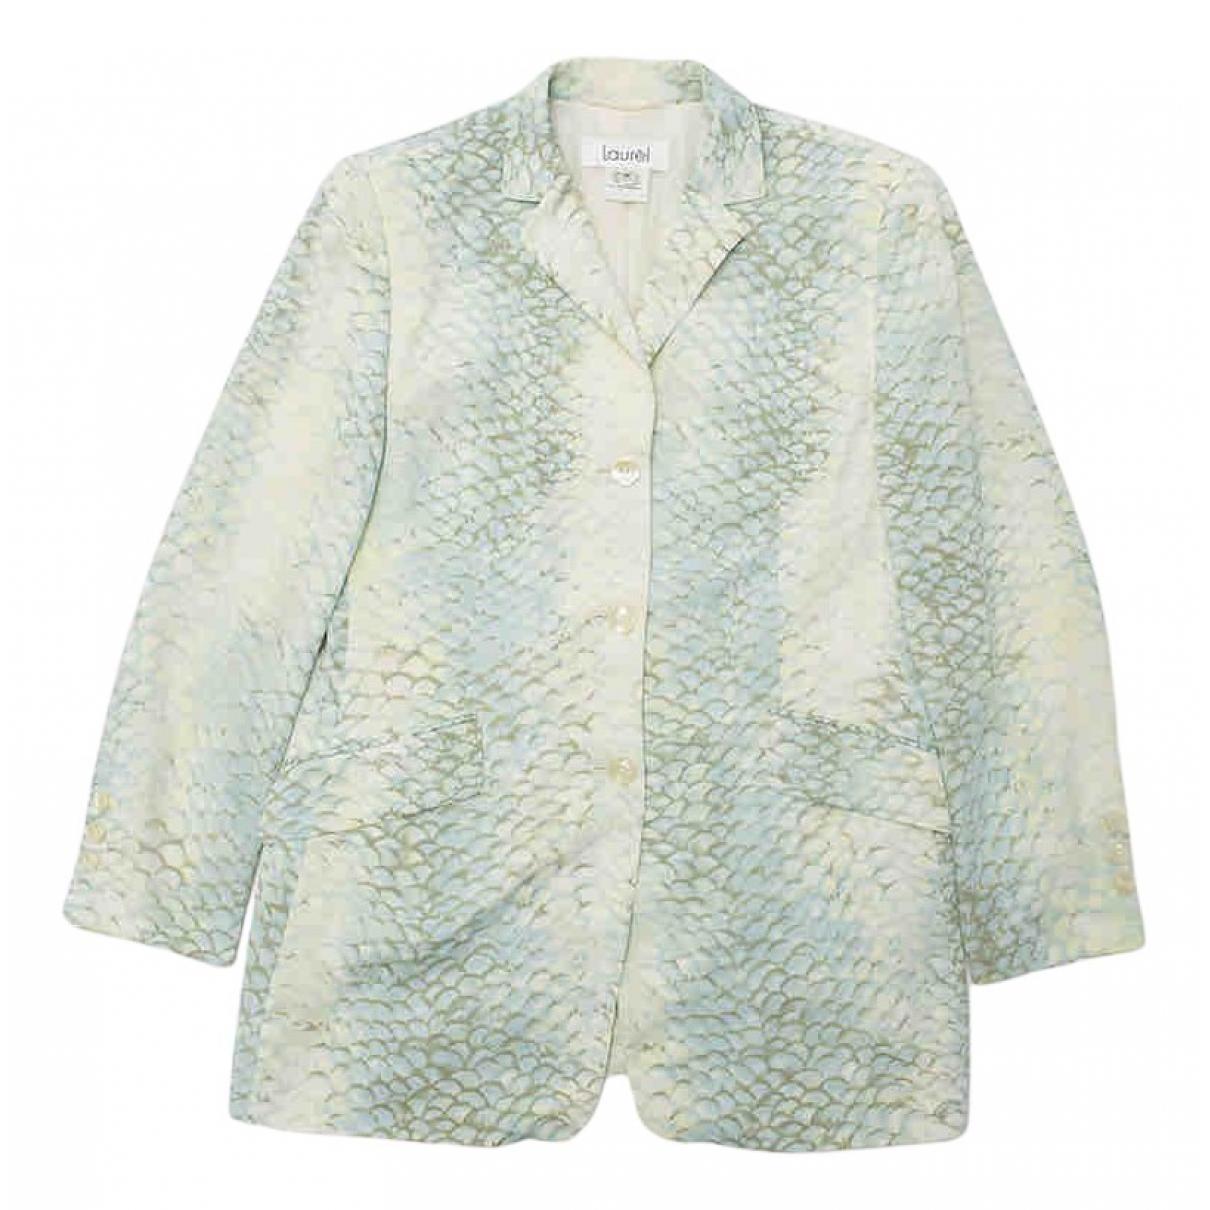 Laurel \N Turquoise jacket for Women 42 FR